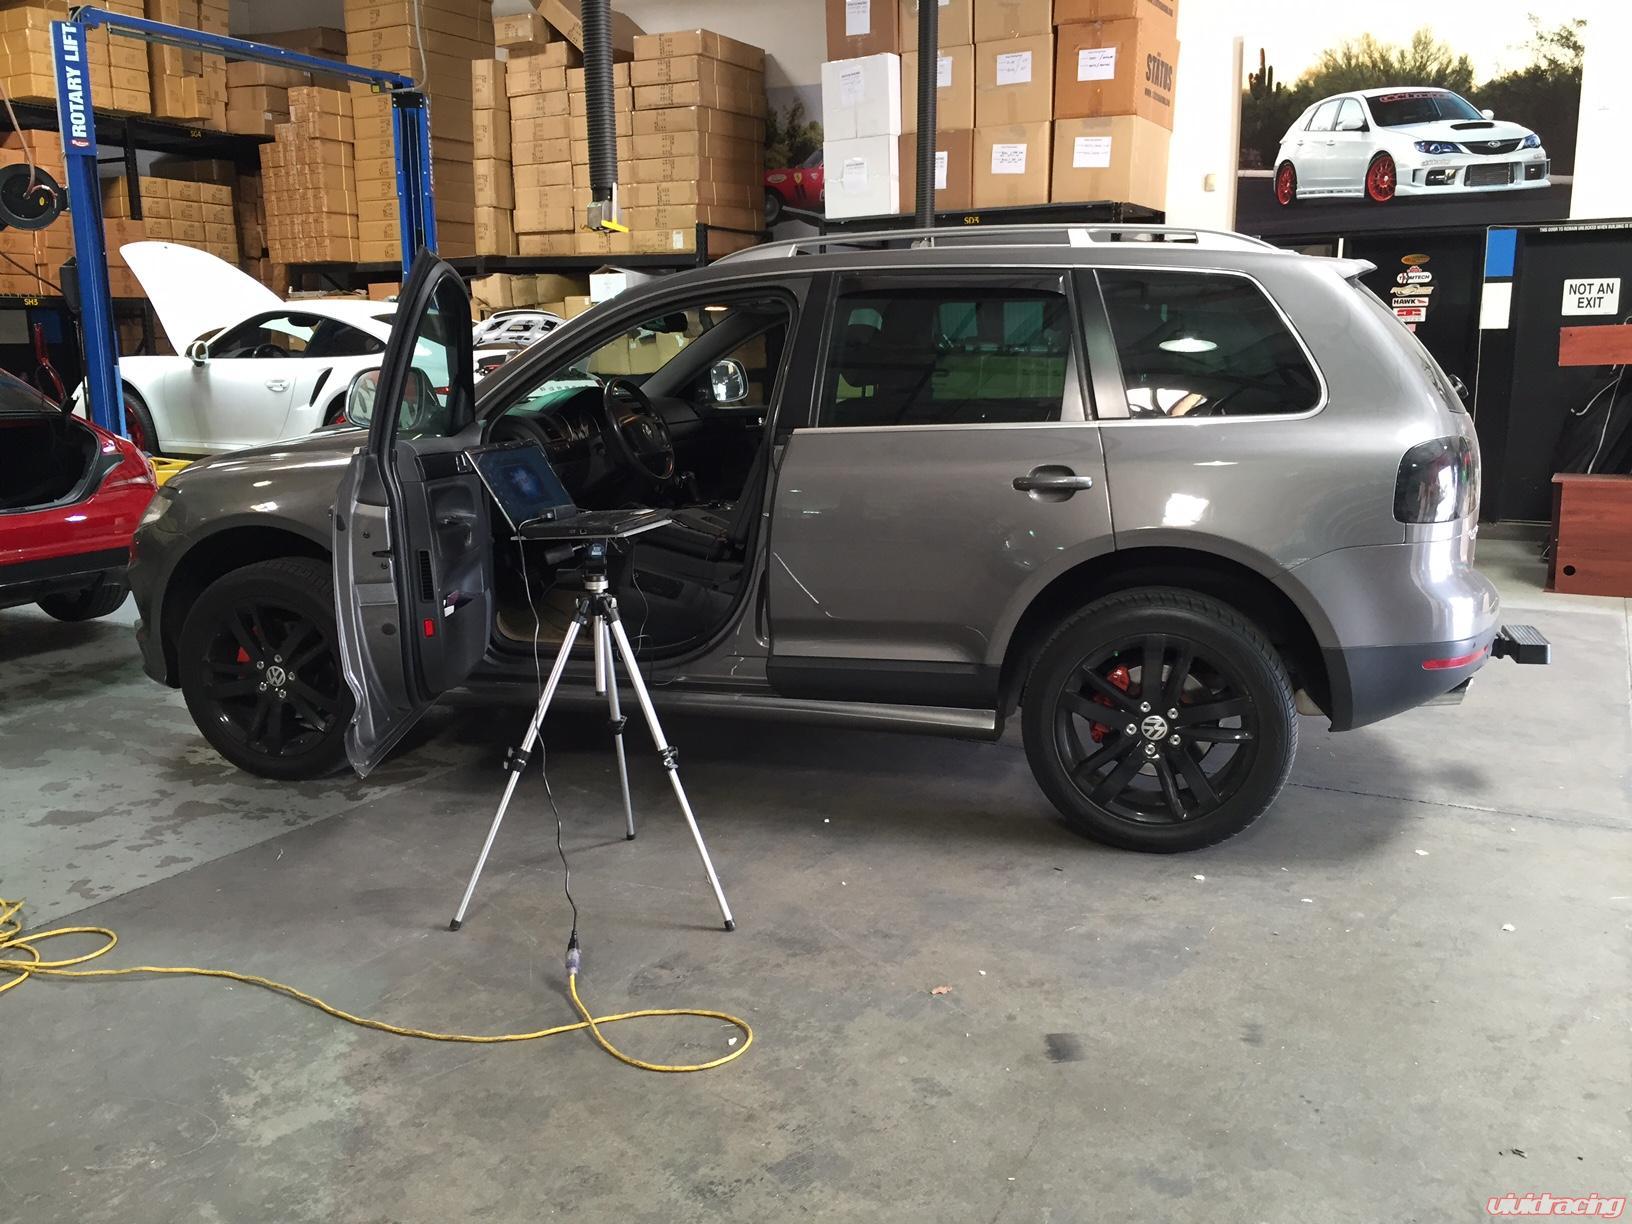 Vr Tuned Ecu Flash Tune Volkswagen Touareg 4 2l V8 350hp Vrt Tor 7l 42l 350